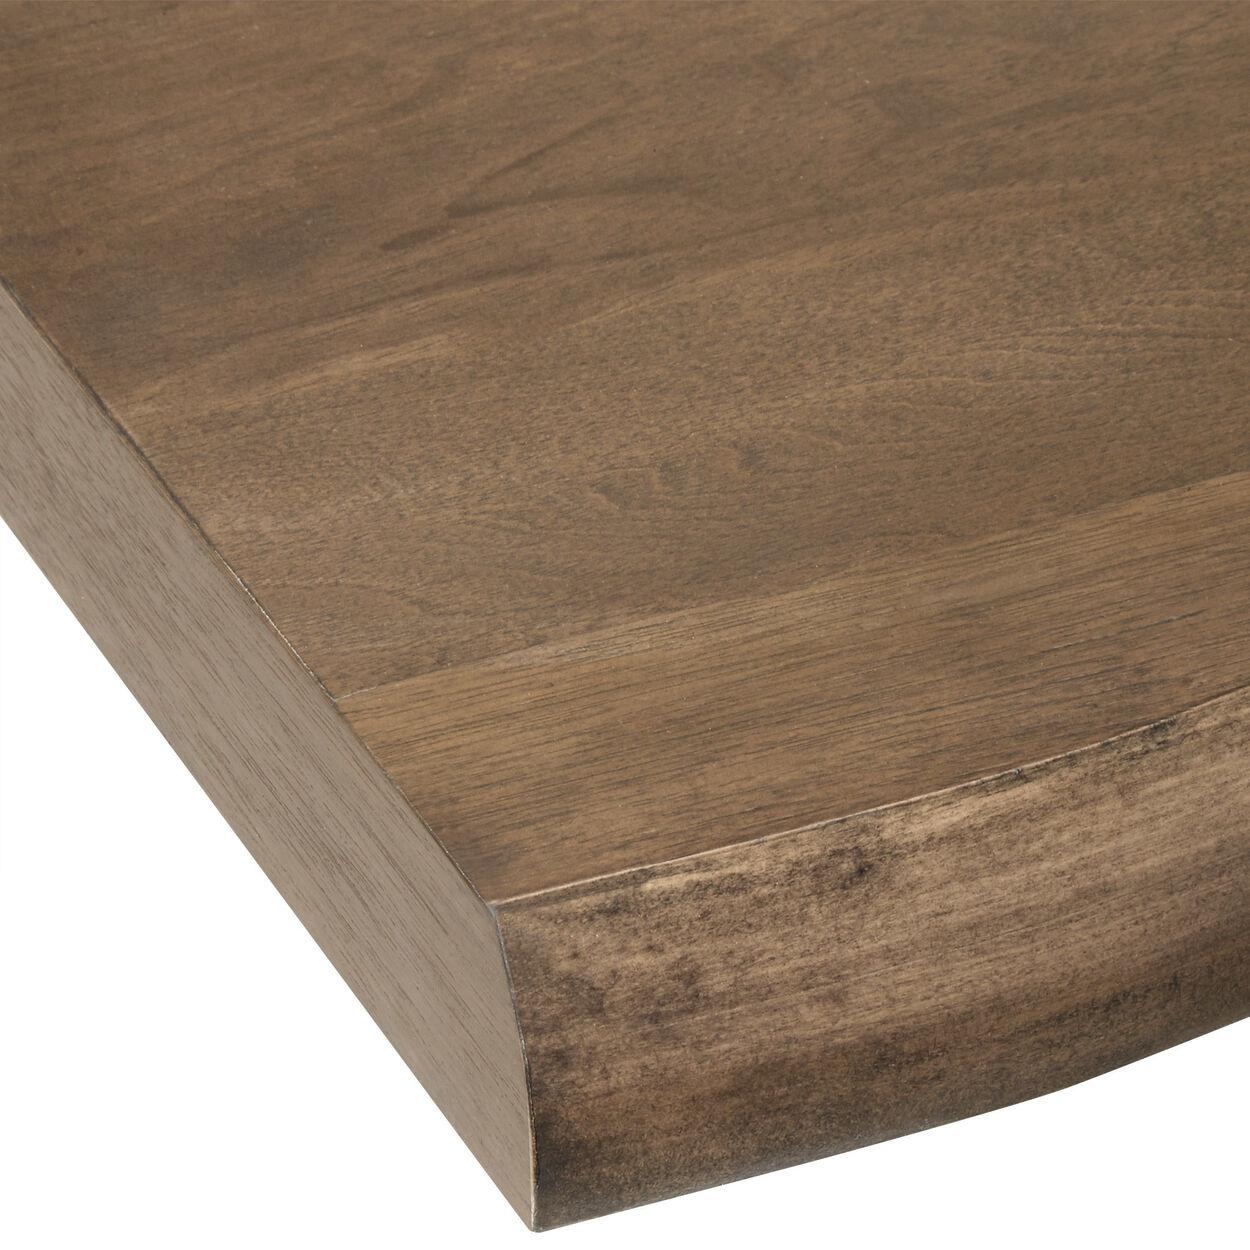 is poplar good for furniture. Live Edge Poplar Wood And MDF Coffee Table Is Good For Furniture